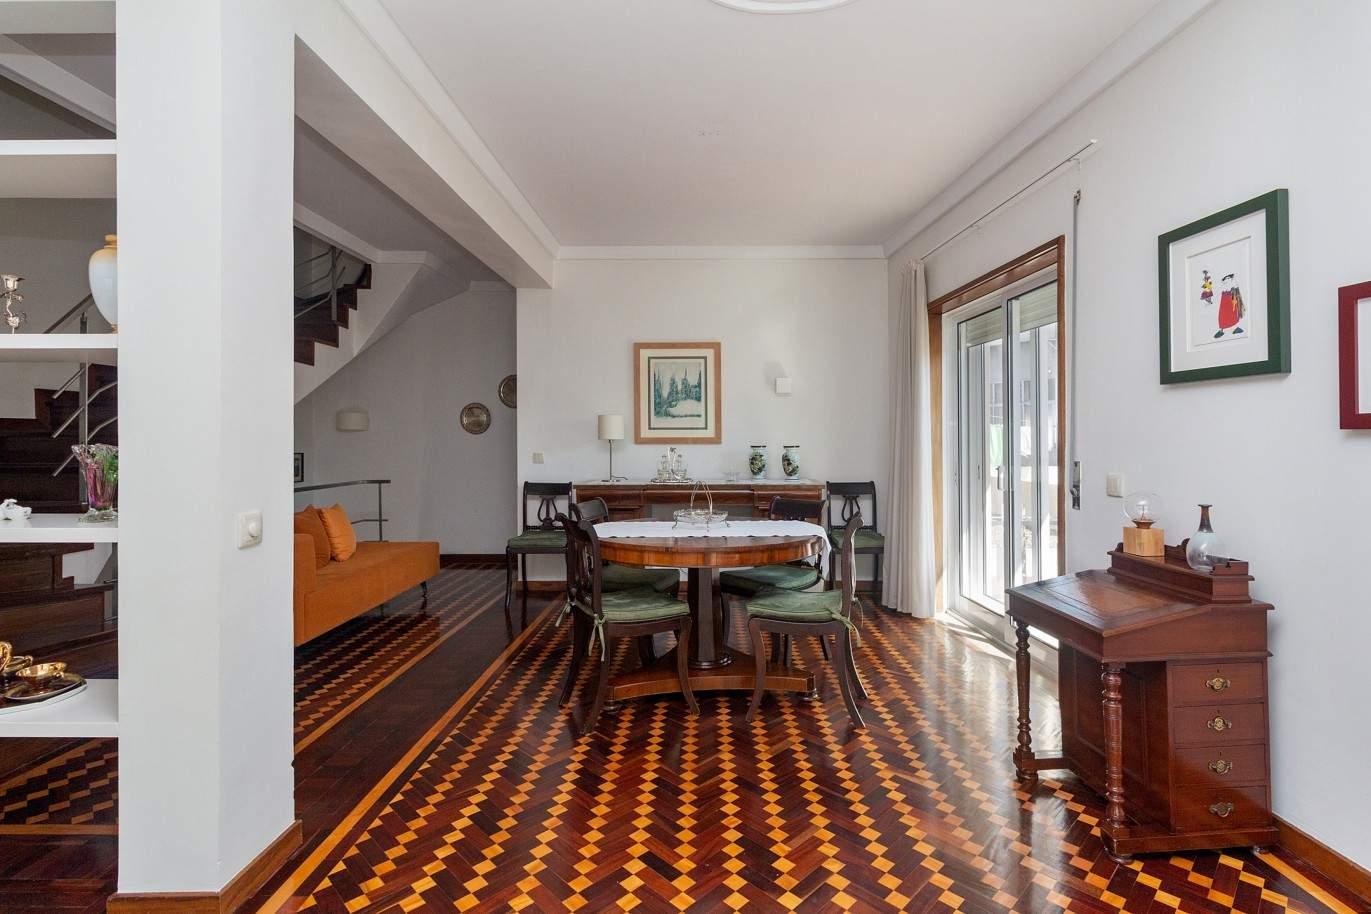 4-bedroom-villa-for-sale-in-ramalde-porto-portugal